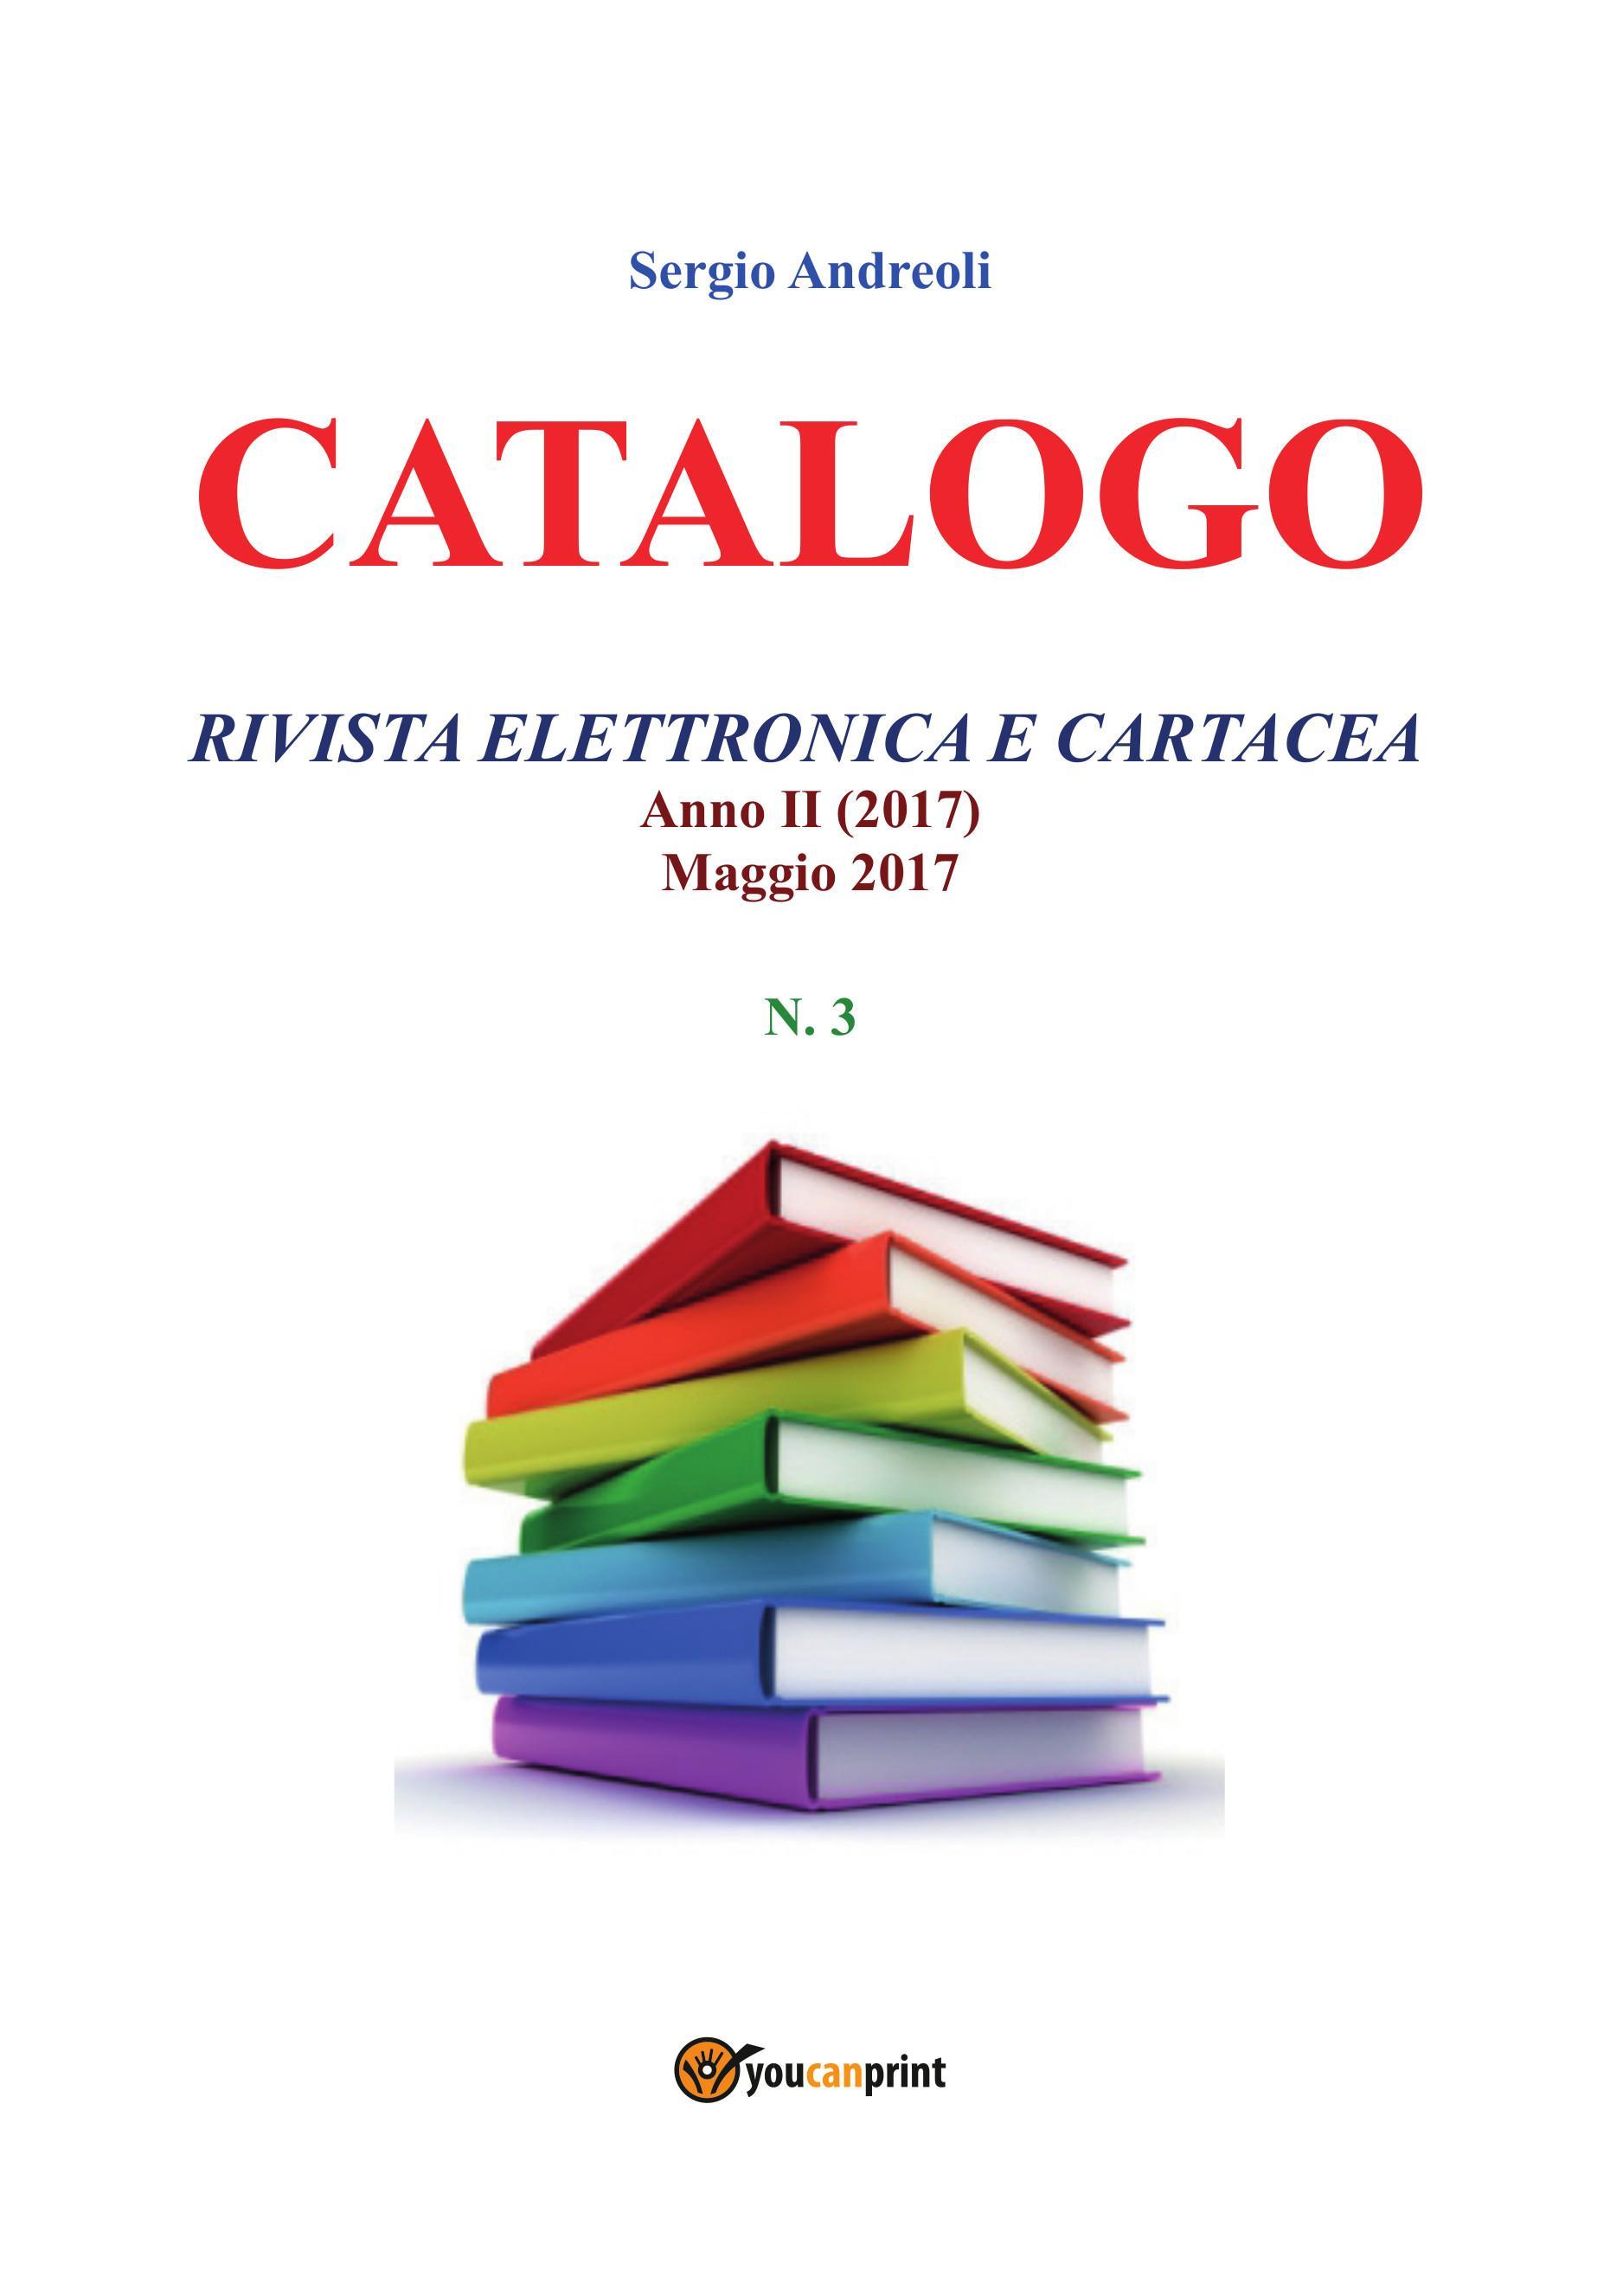 Catalogo n.3